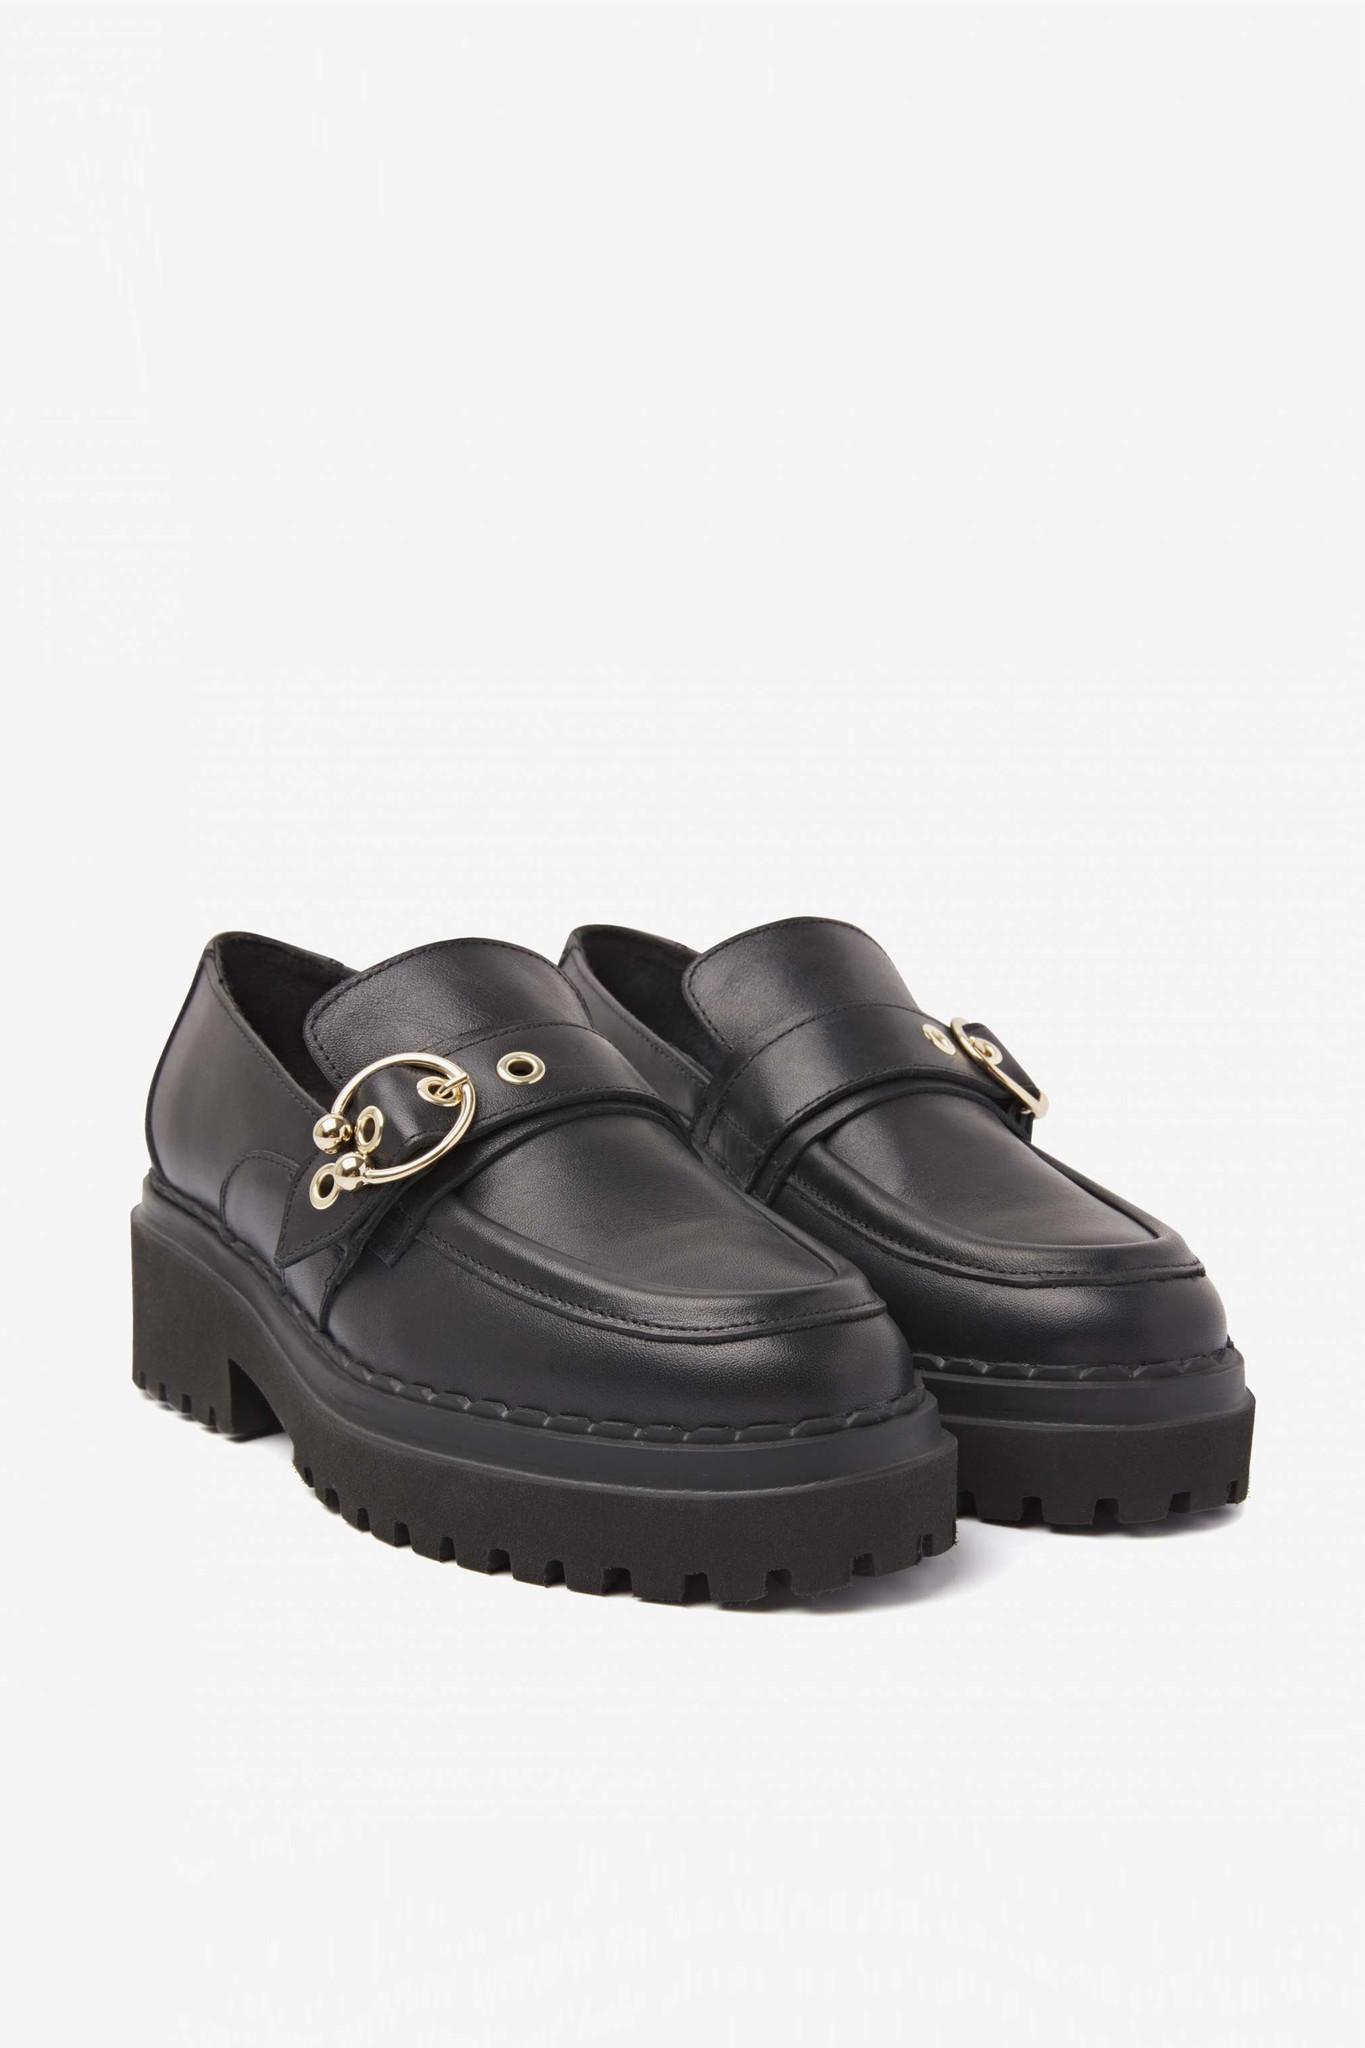 Fae Gatsby Sandals - Black-1